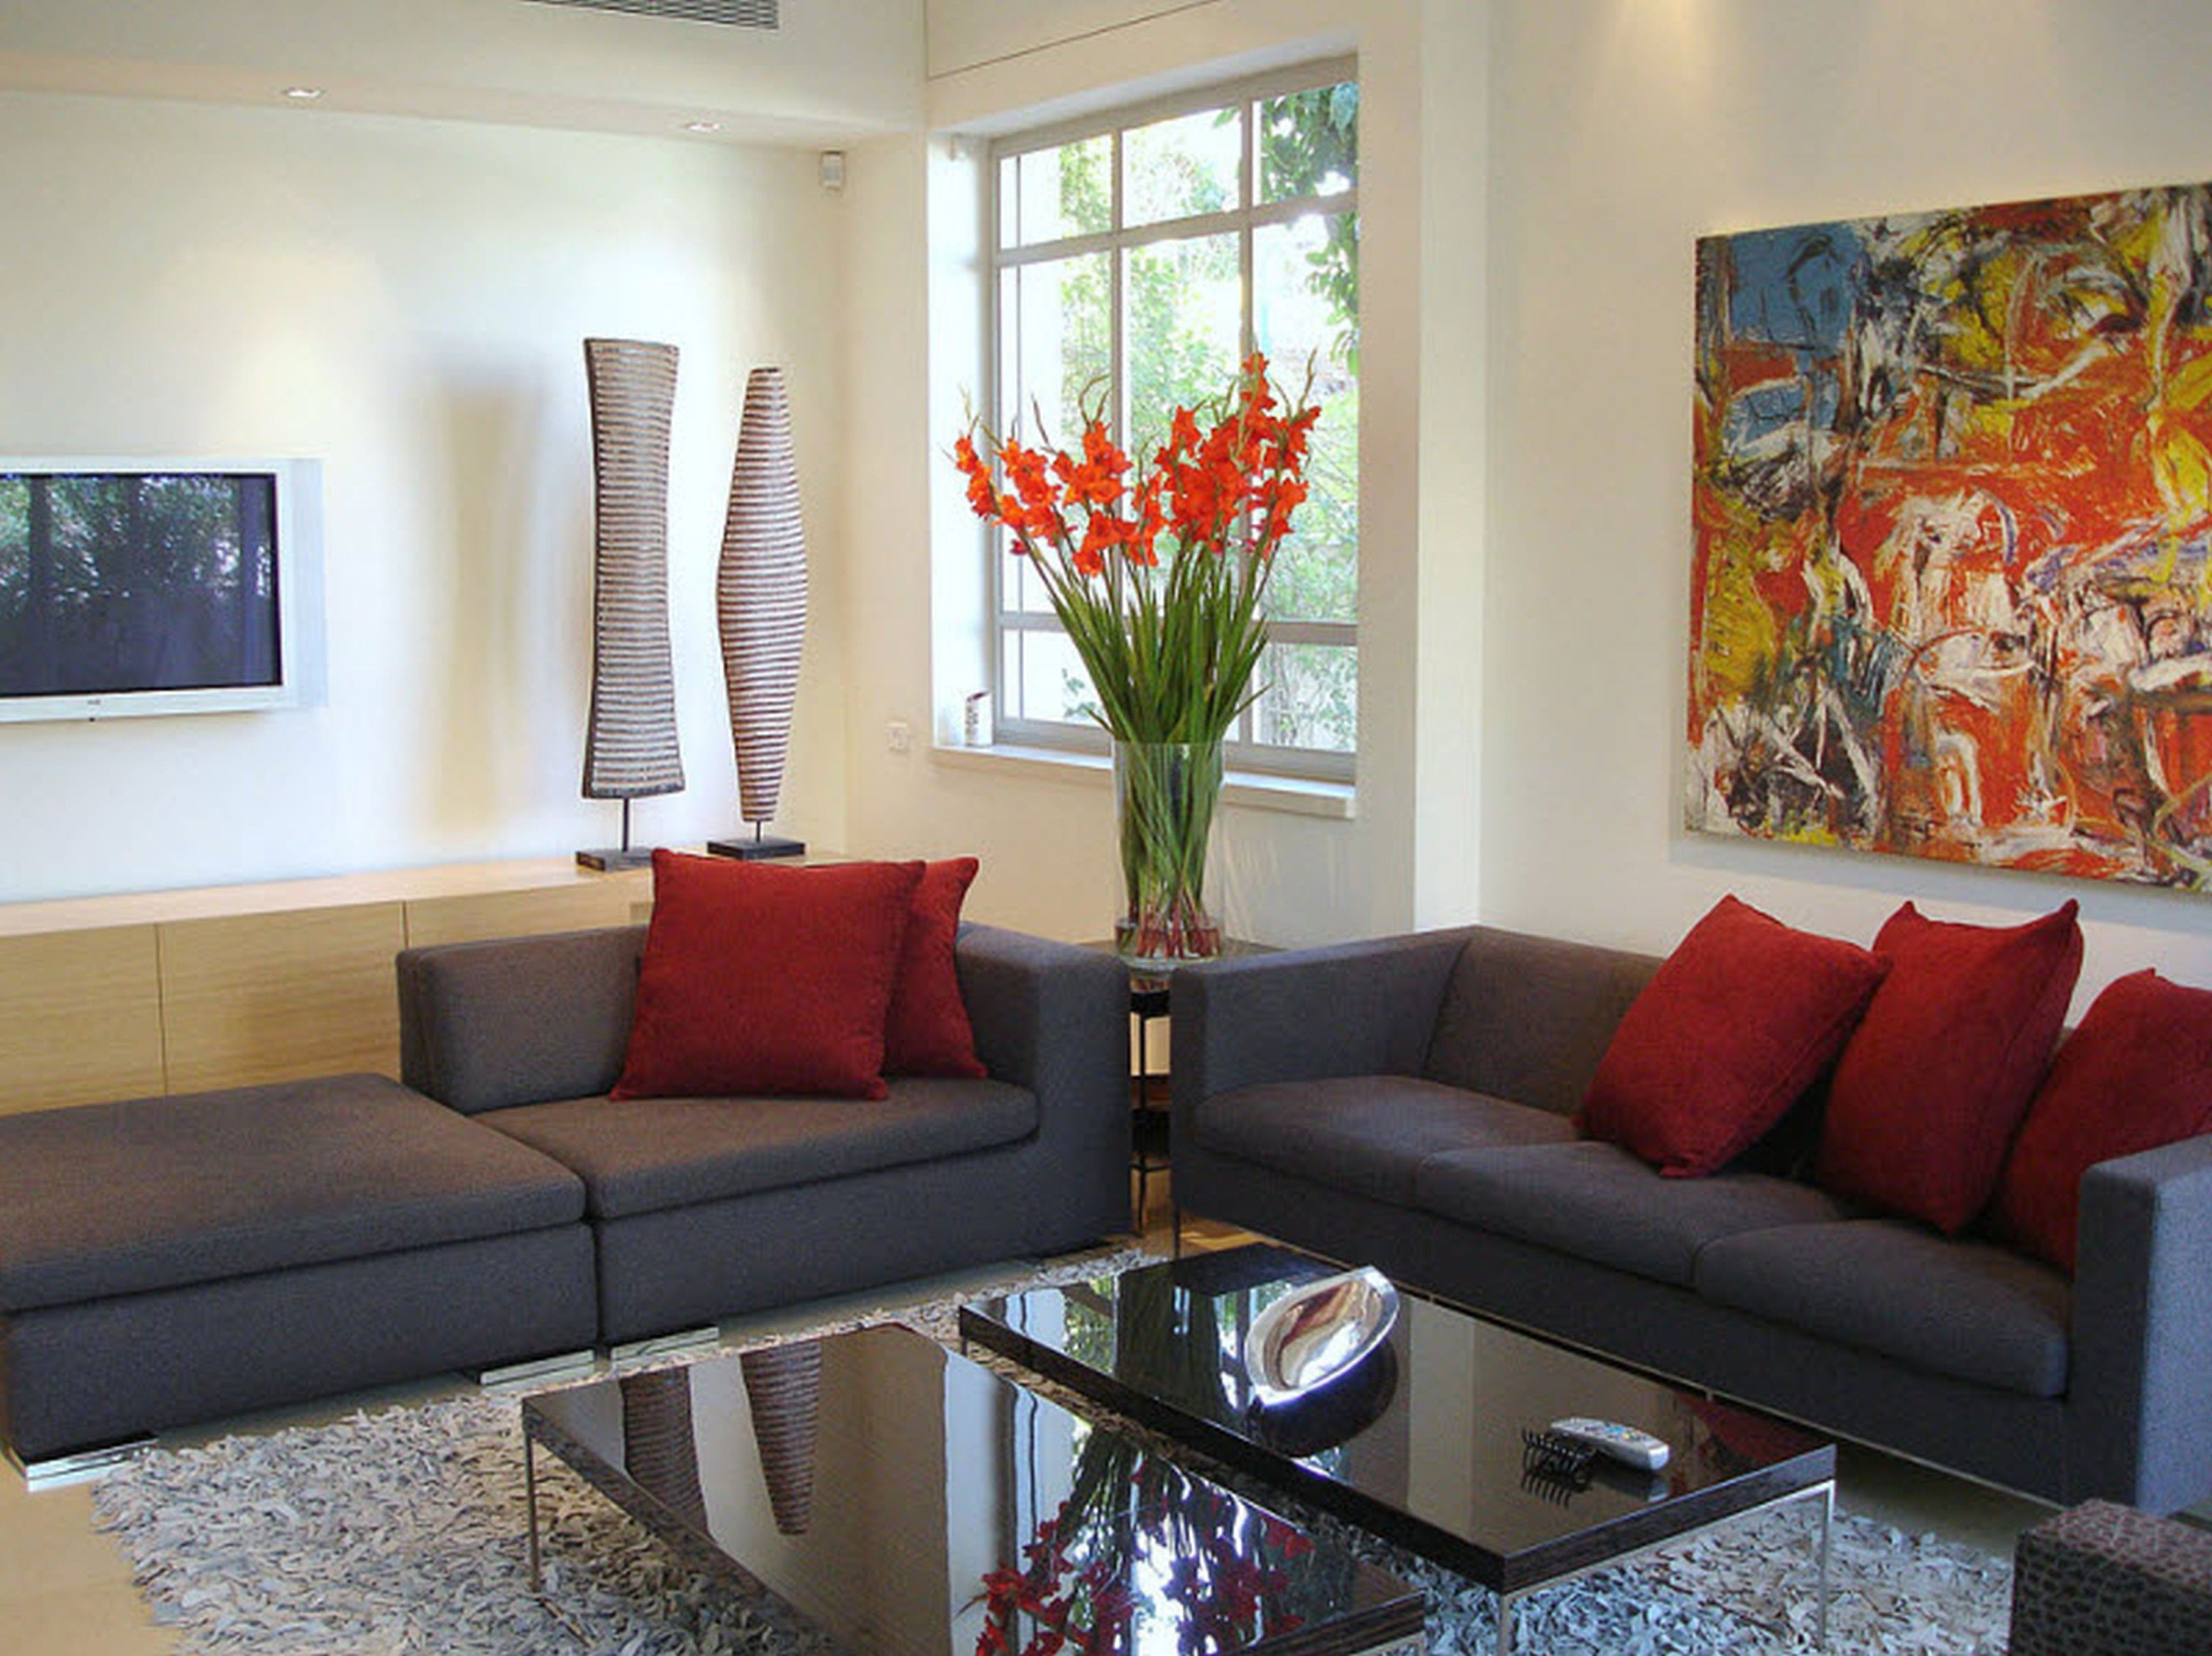 Wonderfulgreywhitewoodglassmoderndesignapartmentliving Entrancing Home Decor Ideas For Living Room Design Ideas